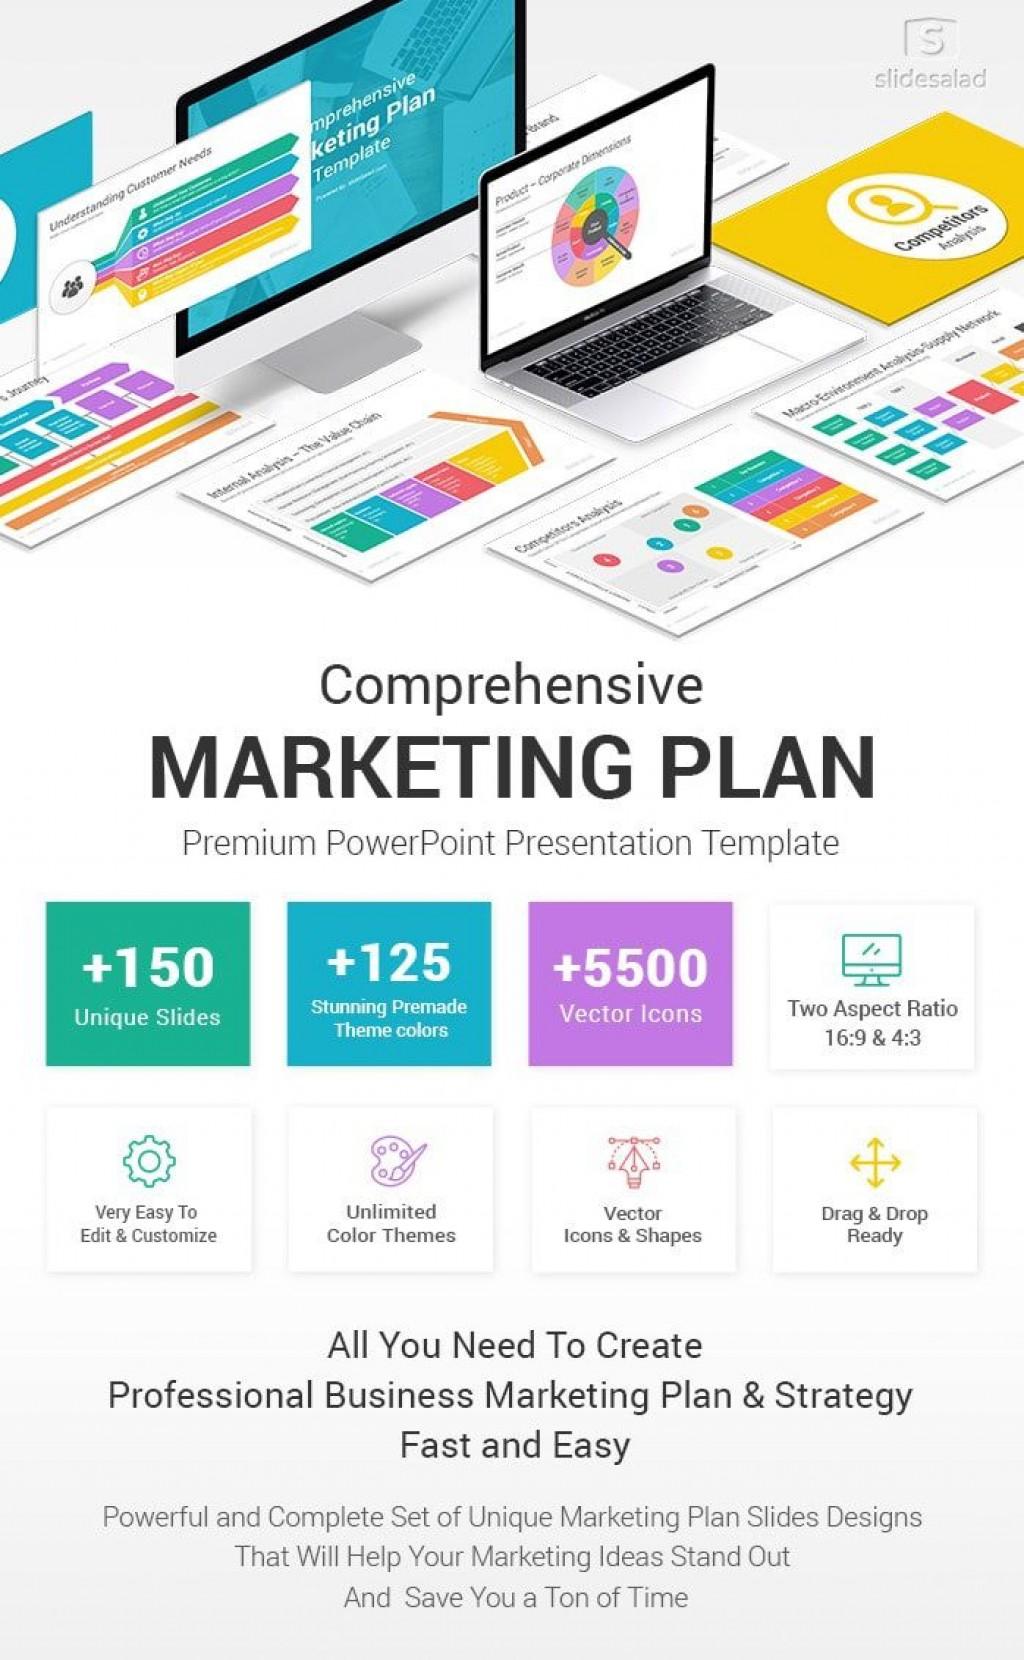 006 Imposing Digital Marketing Plan Template Ppt Inspiration  Presentation Free SlideshareLarge